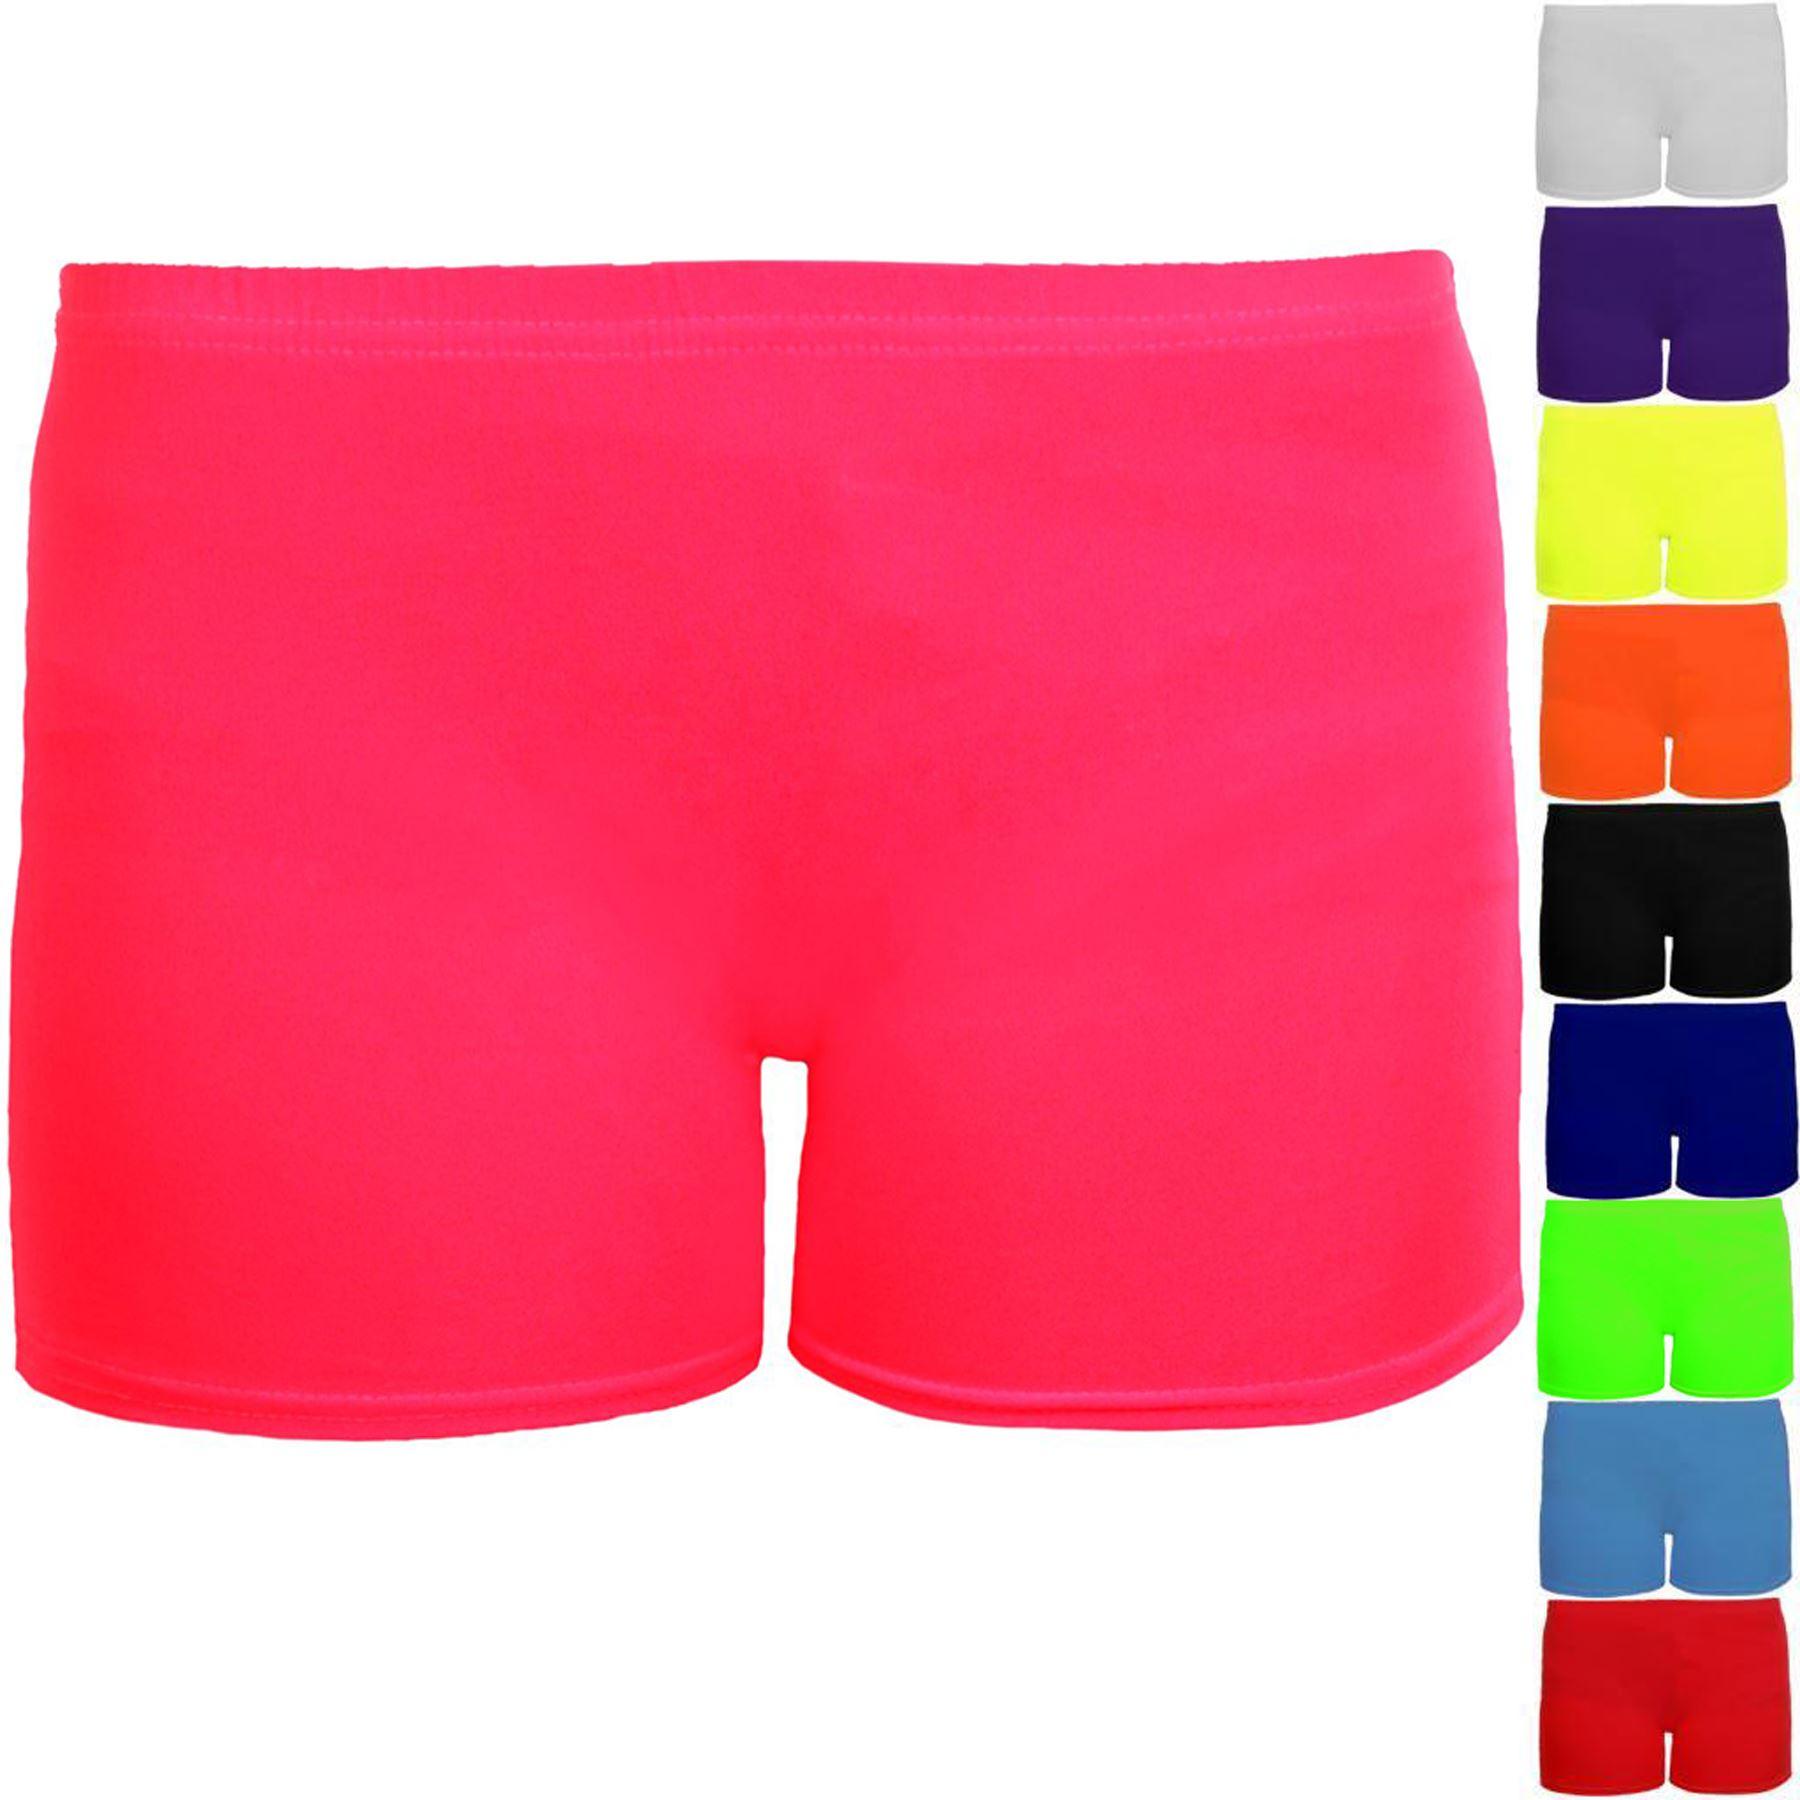 Girls Metallic Gymnastics Gym Dance Stretch Party Children/'s Hot Pants Shorts